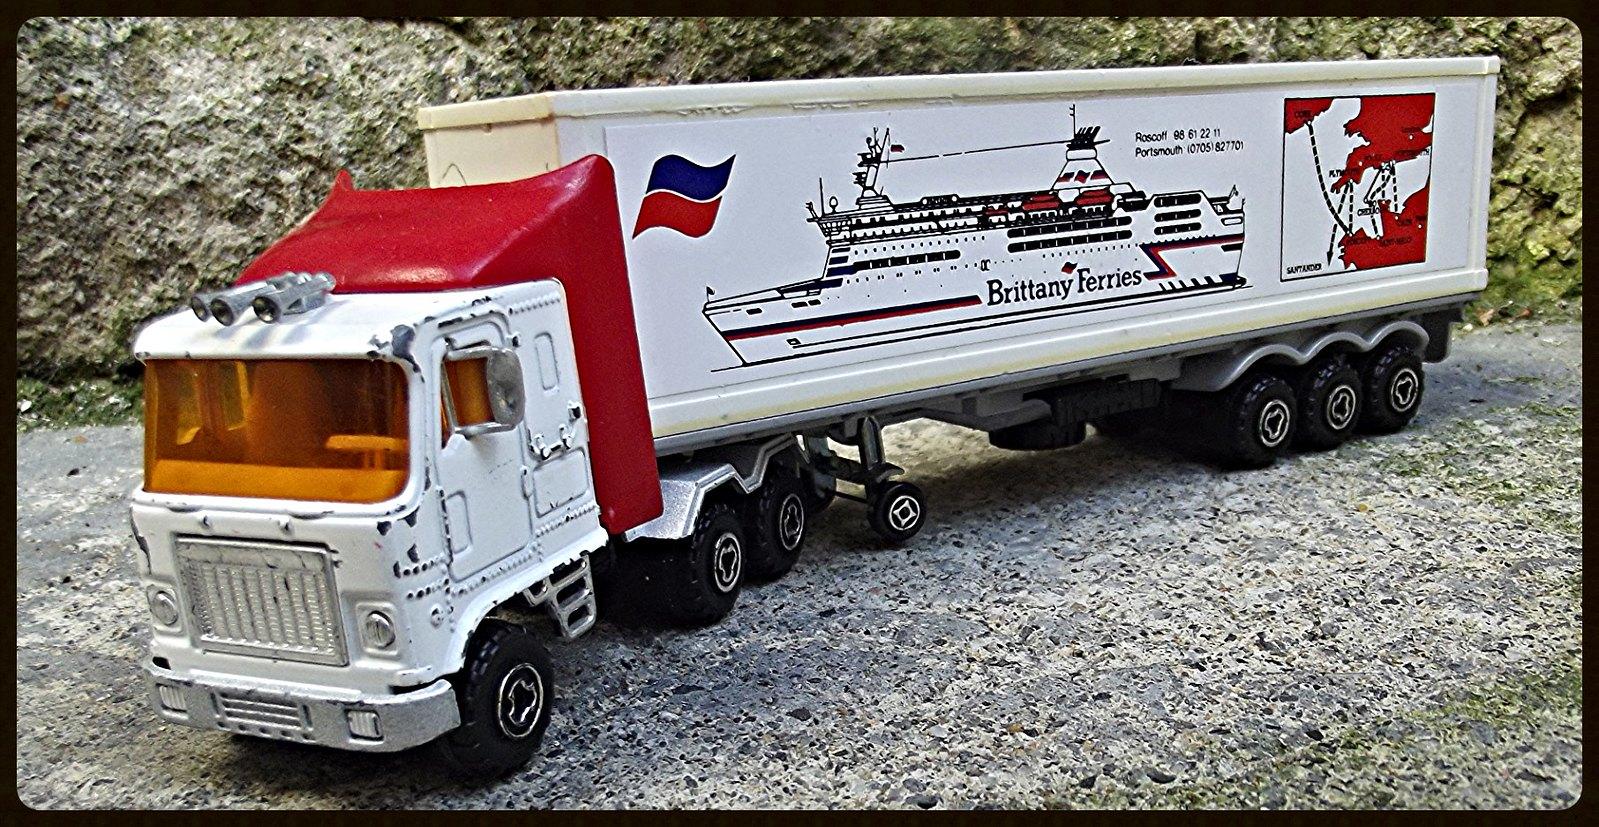 Brittany ferries /truckline ferries. 15513471776_d0b2680f06_h